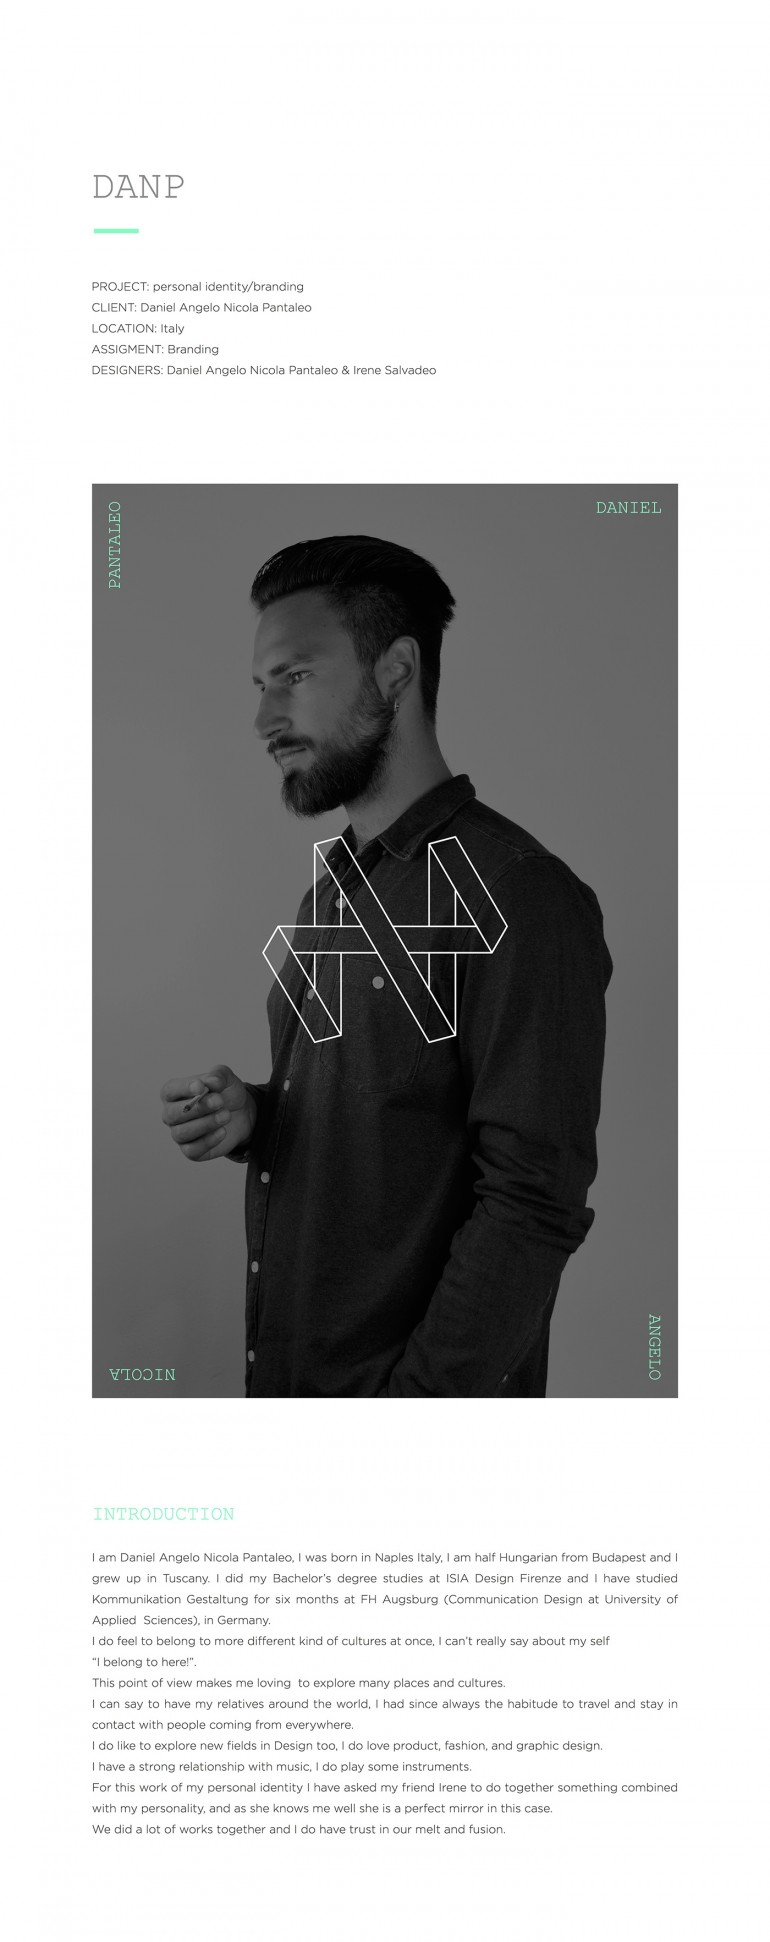 Daniel Angelo Nicola Pantaleo – Personal identity / Branding